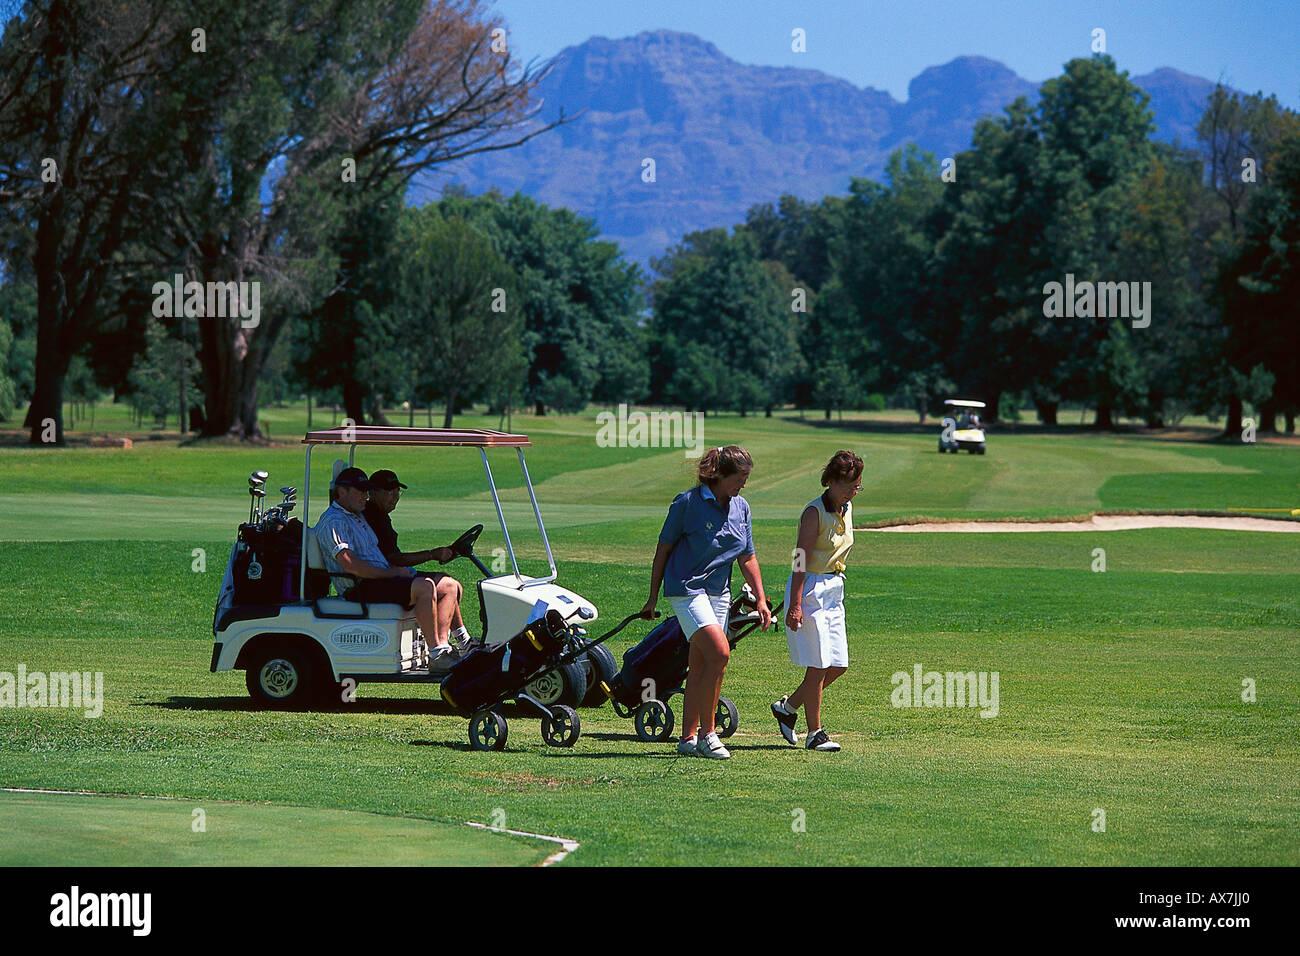 Golfplatz Stellenbosch, Kapregion Suedafrika - Stock Image